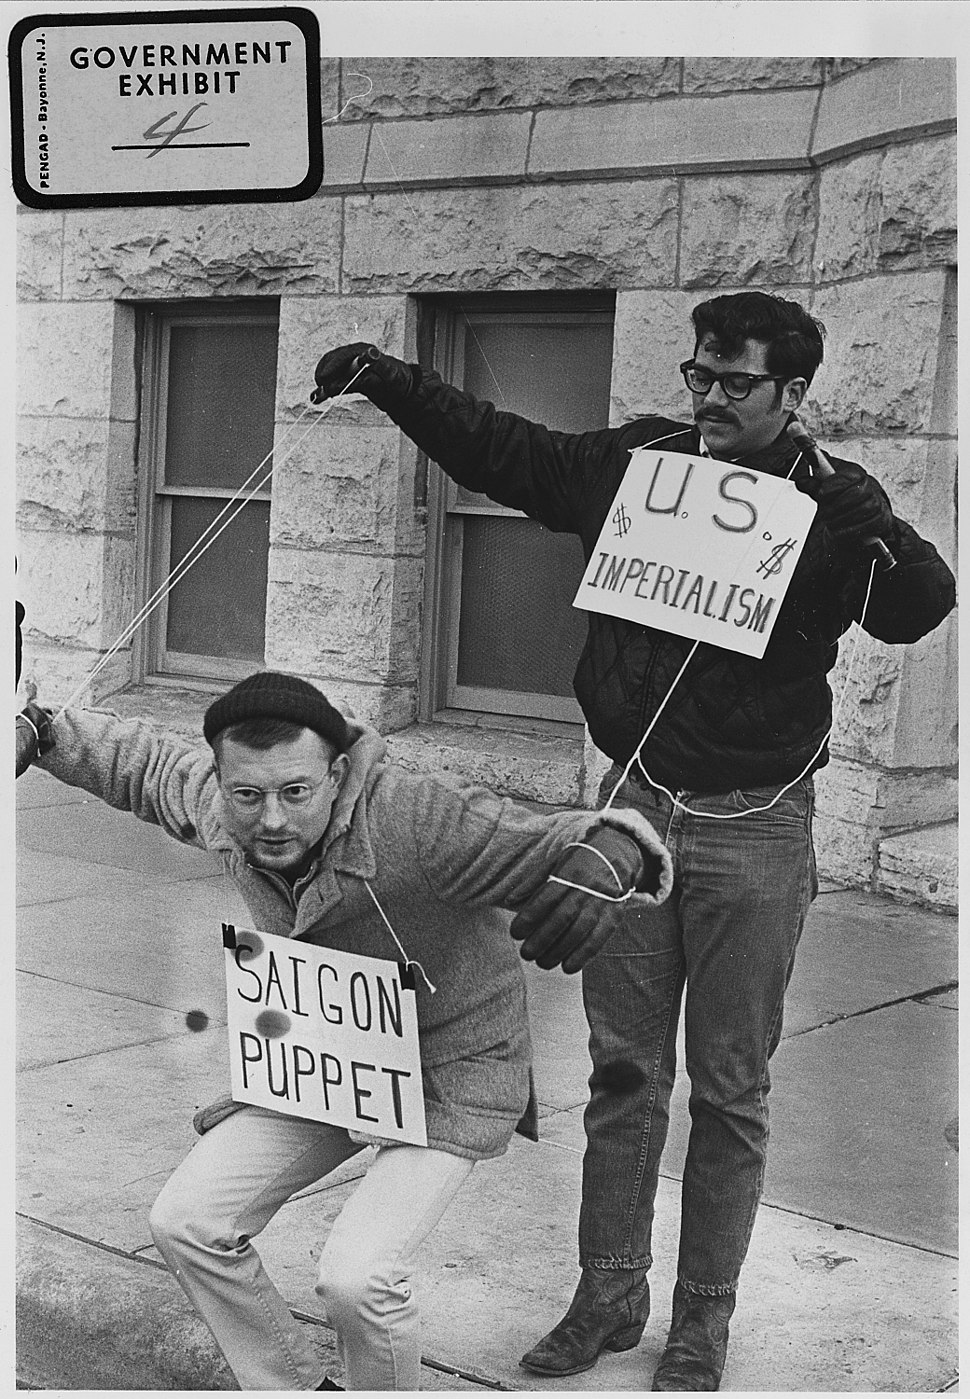 Vietnam War protesters. 1967. Wichita, Kans - NARA - 283627